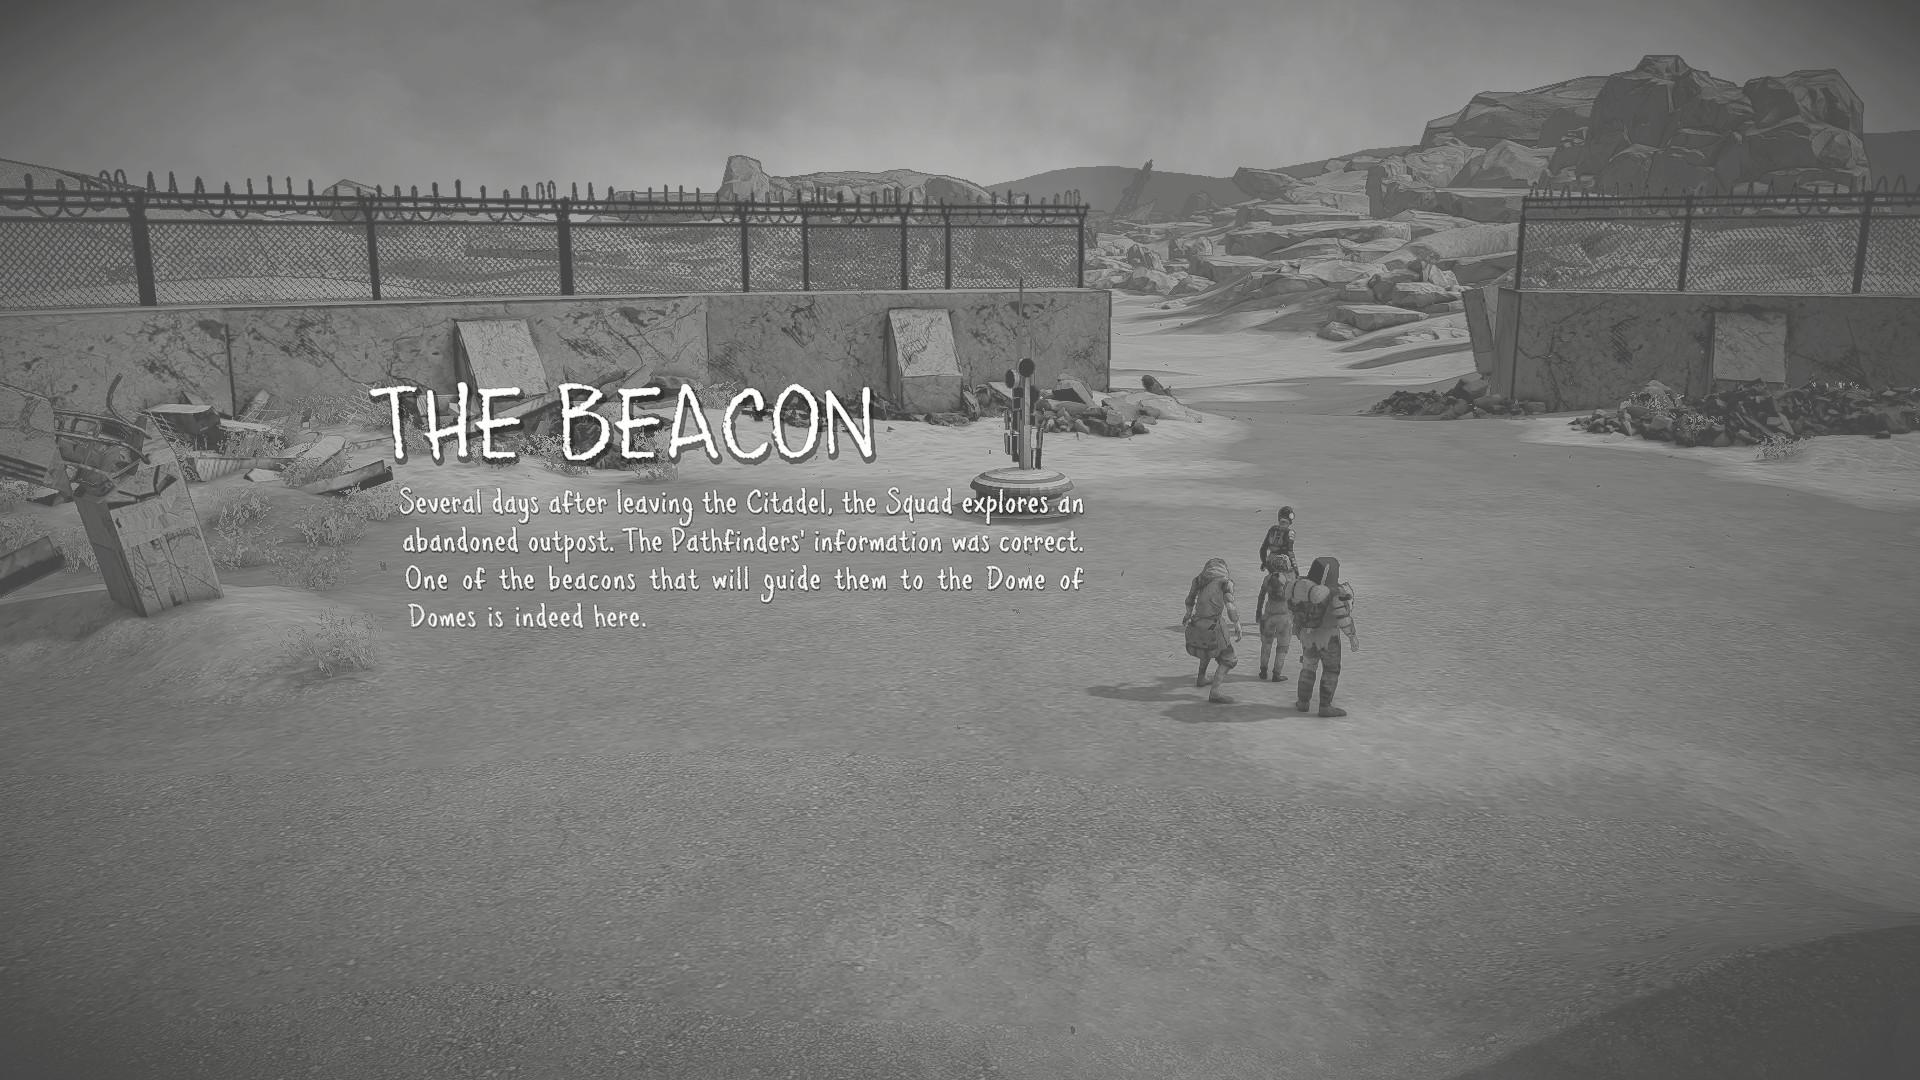 Ashwalkers Beacon